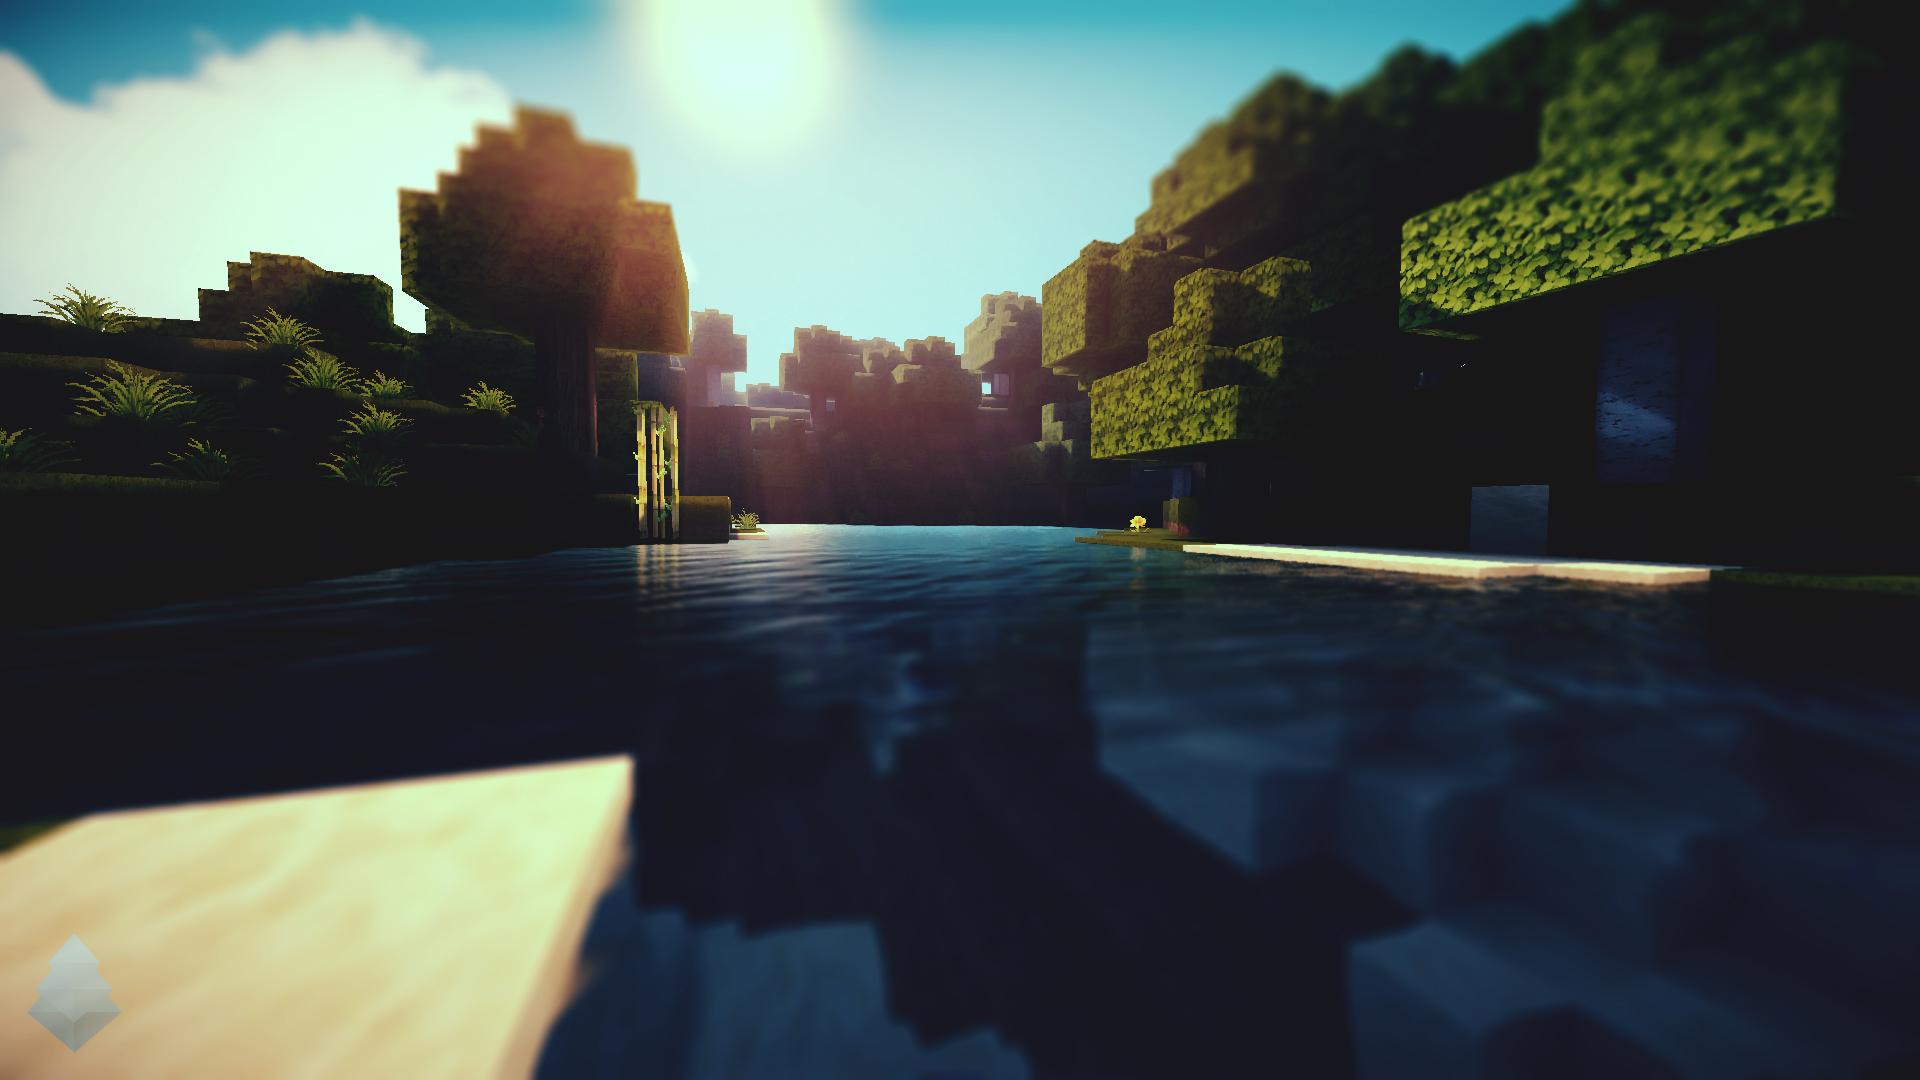 Minecraft Shaders Wallpaper Hd Wallpapersafari